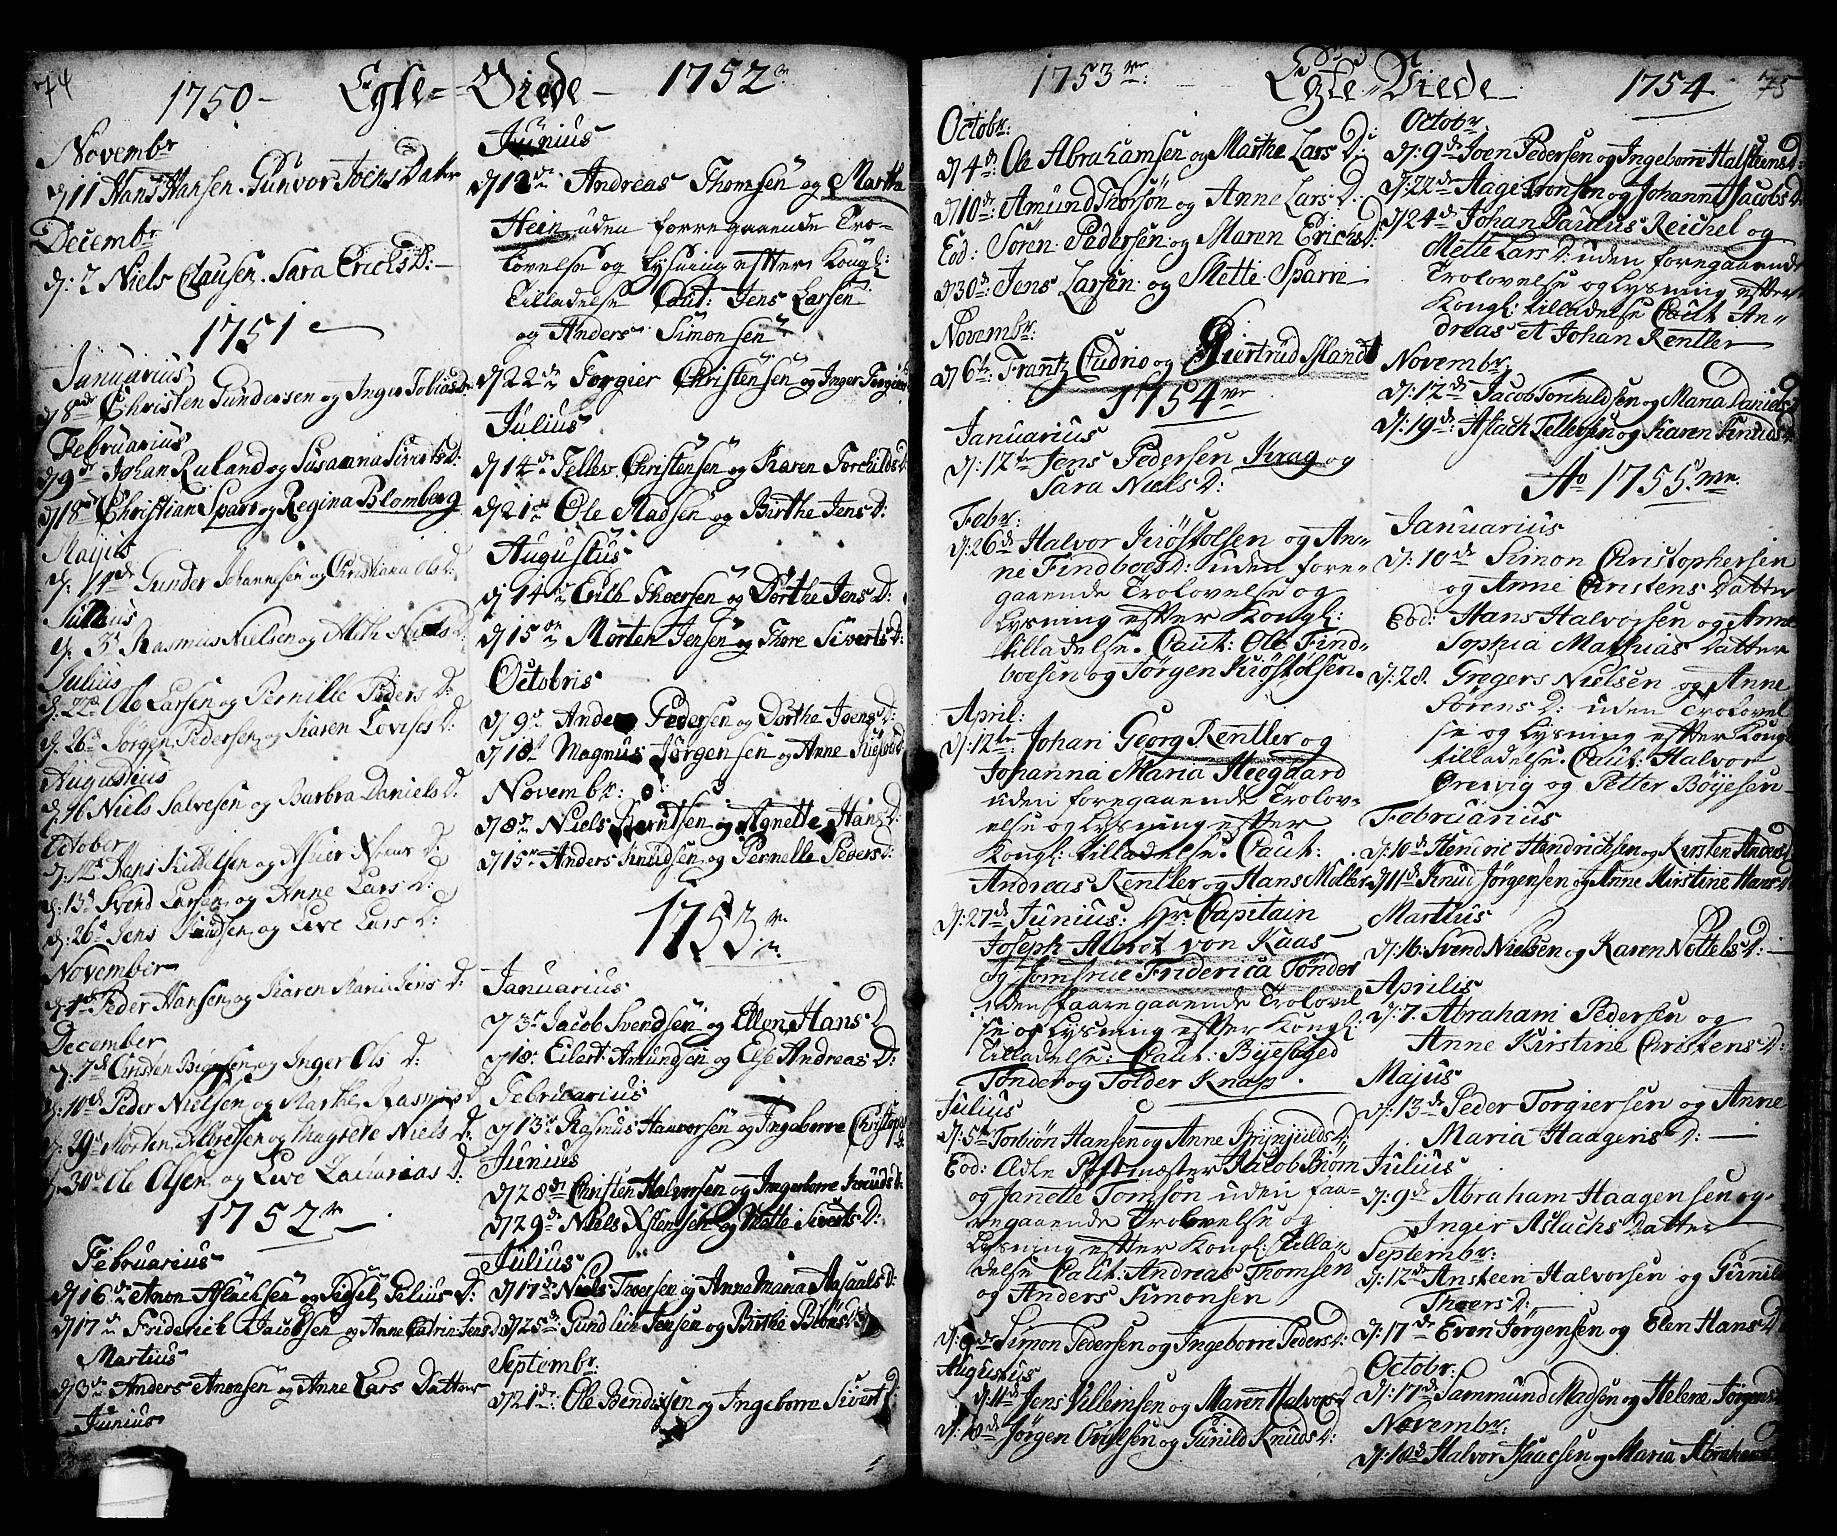 SAKO, Kragerø kirkebøker, F/Fa/L0001: Ministerialbok nr. 1, 1702-1766, s. 74-75